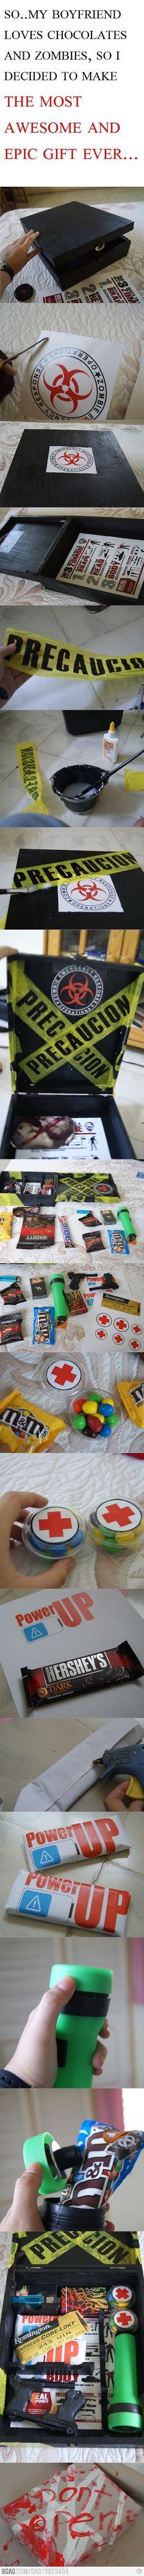 Zombie survival kit jajaja bien regalo para san Valentín